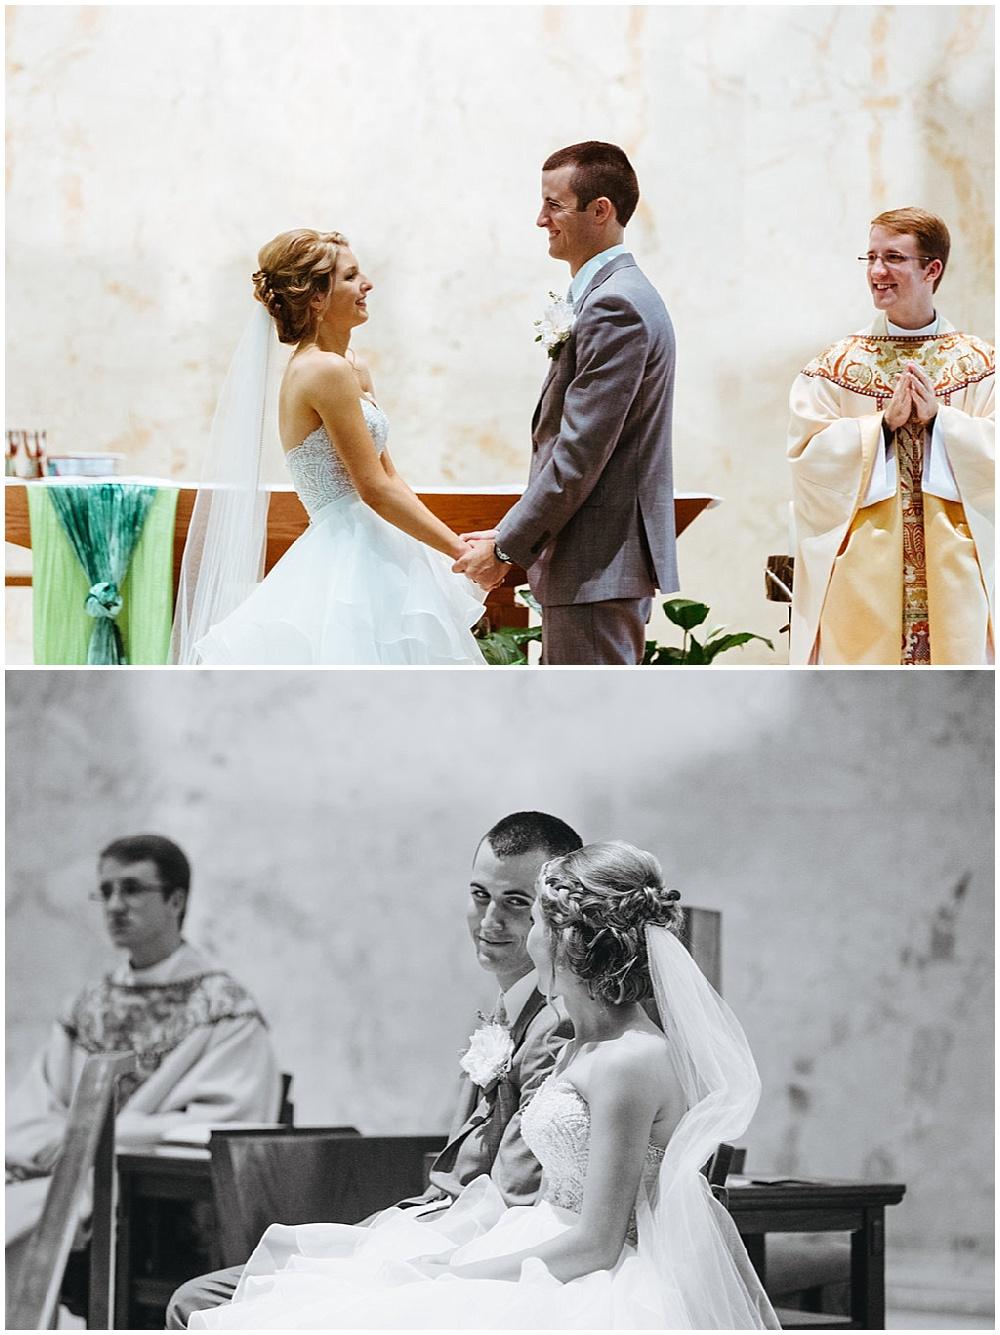 ceremony   Chicago urban rustic wedding  Sandra Armenteros Photography   Jessica Dum Wedding Coordination